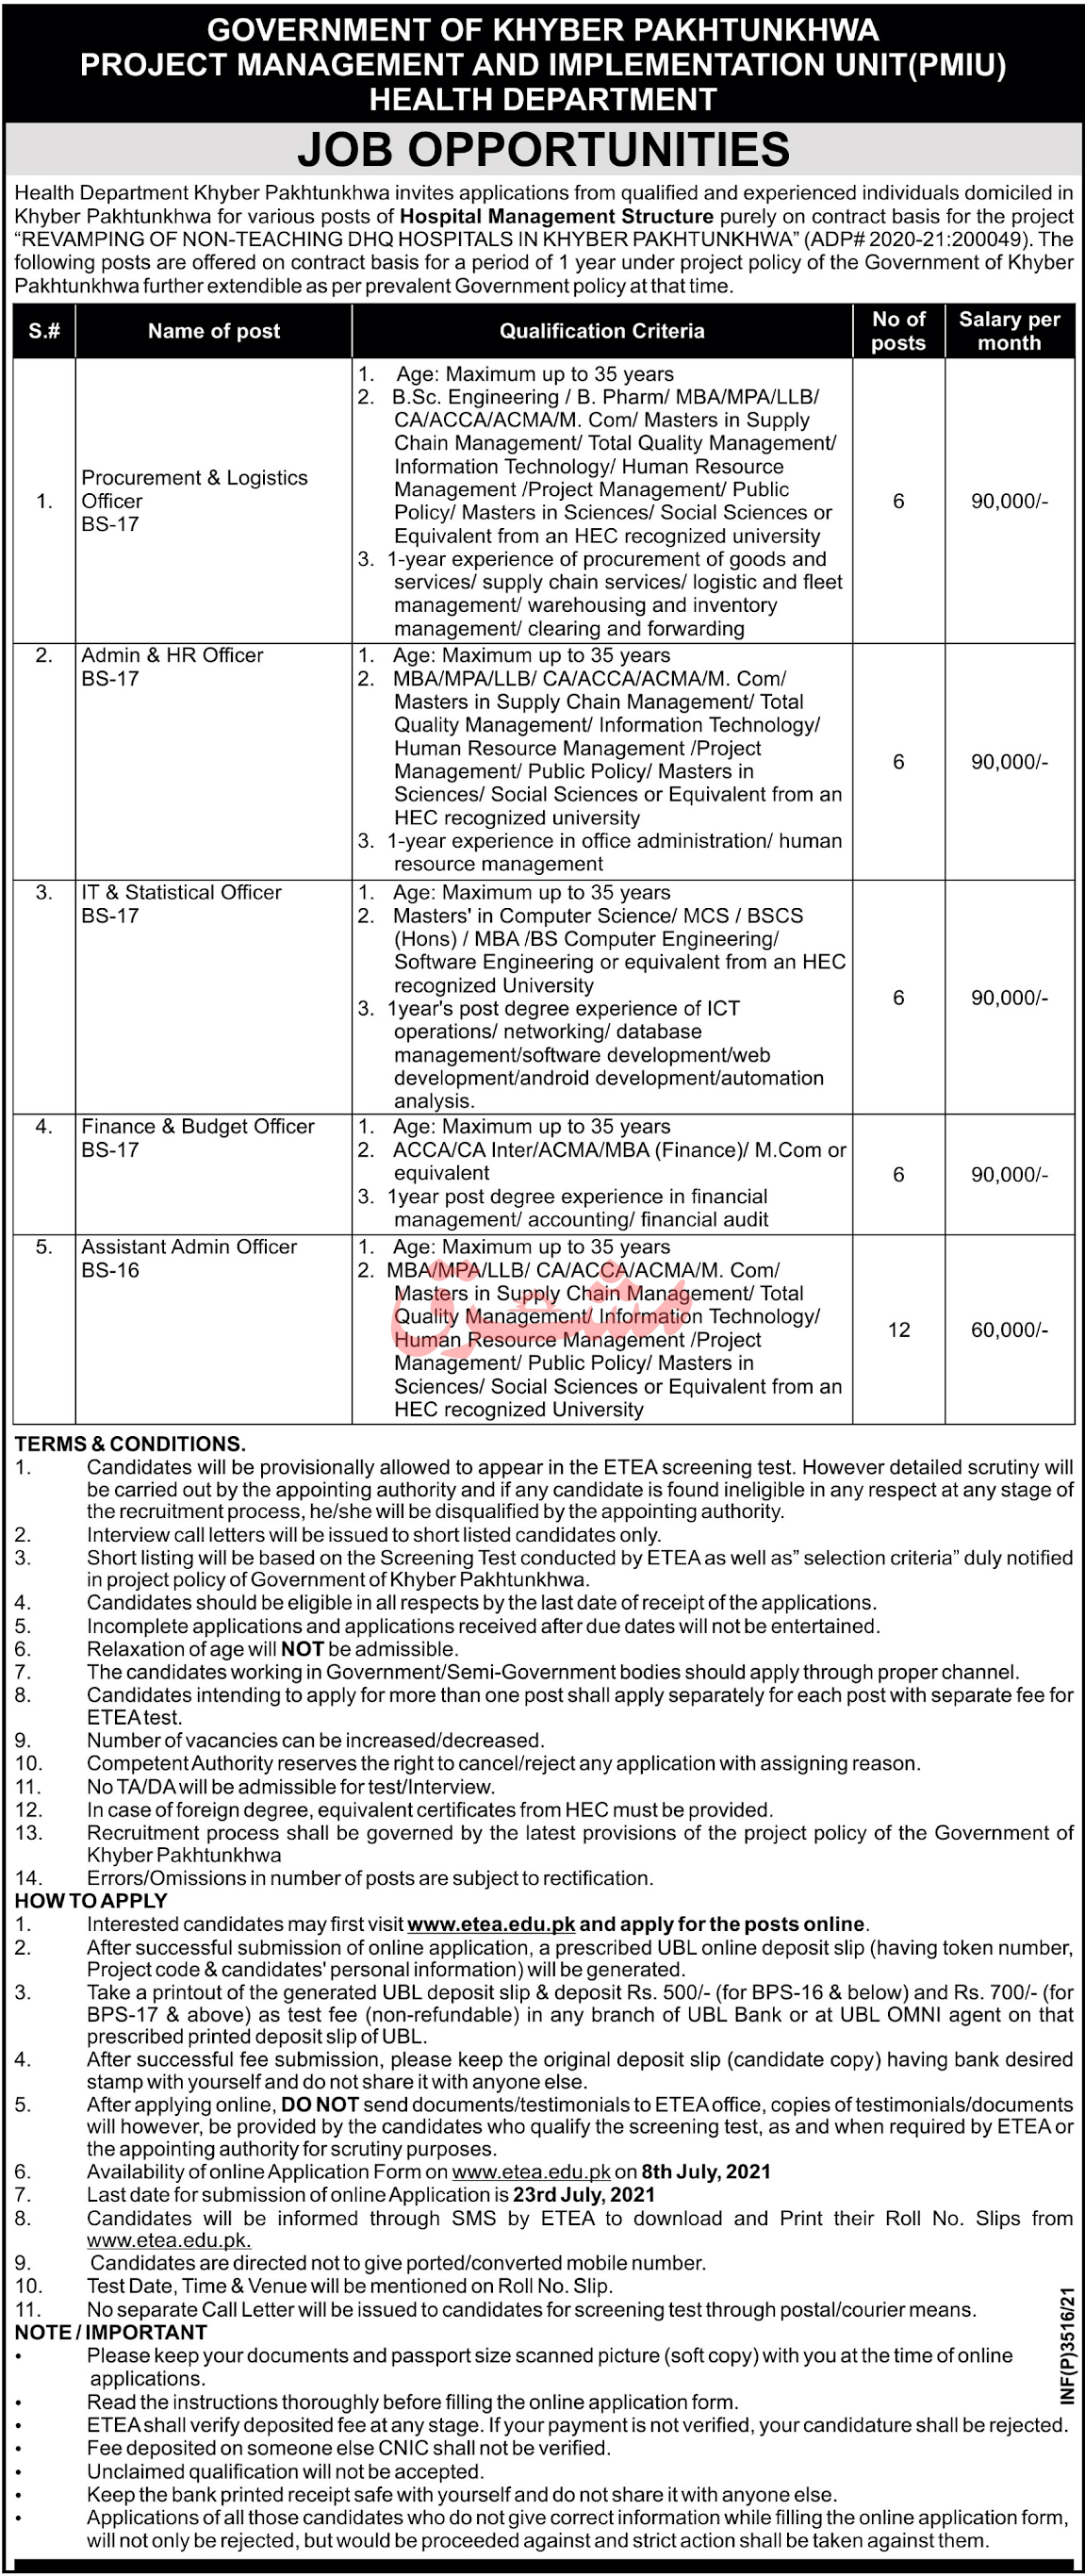 KPK Health Department Jobs 2021 Advertisement No 2